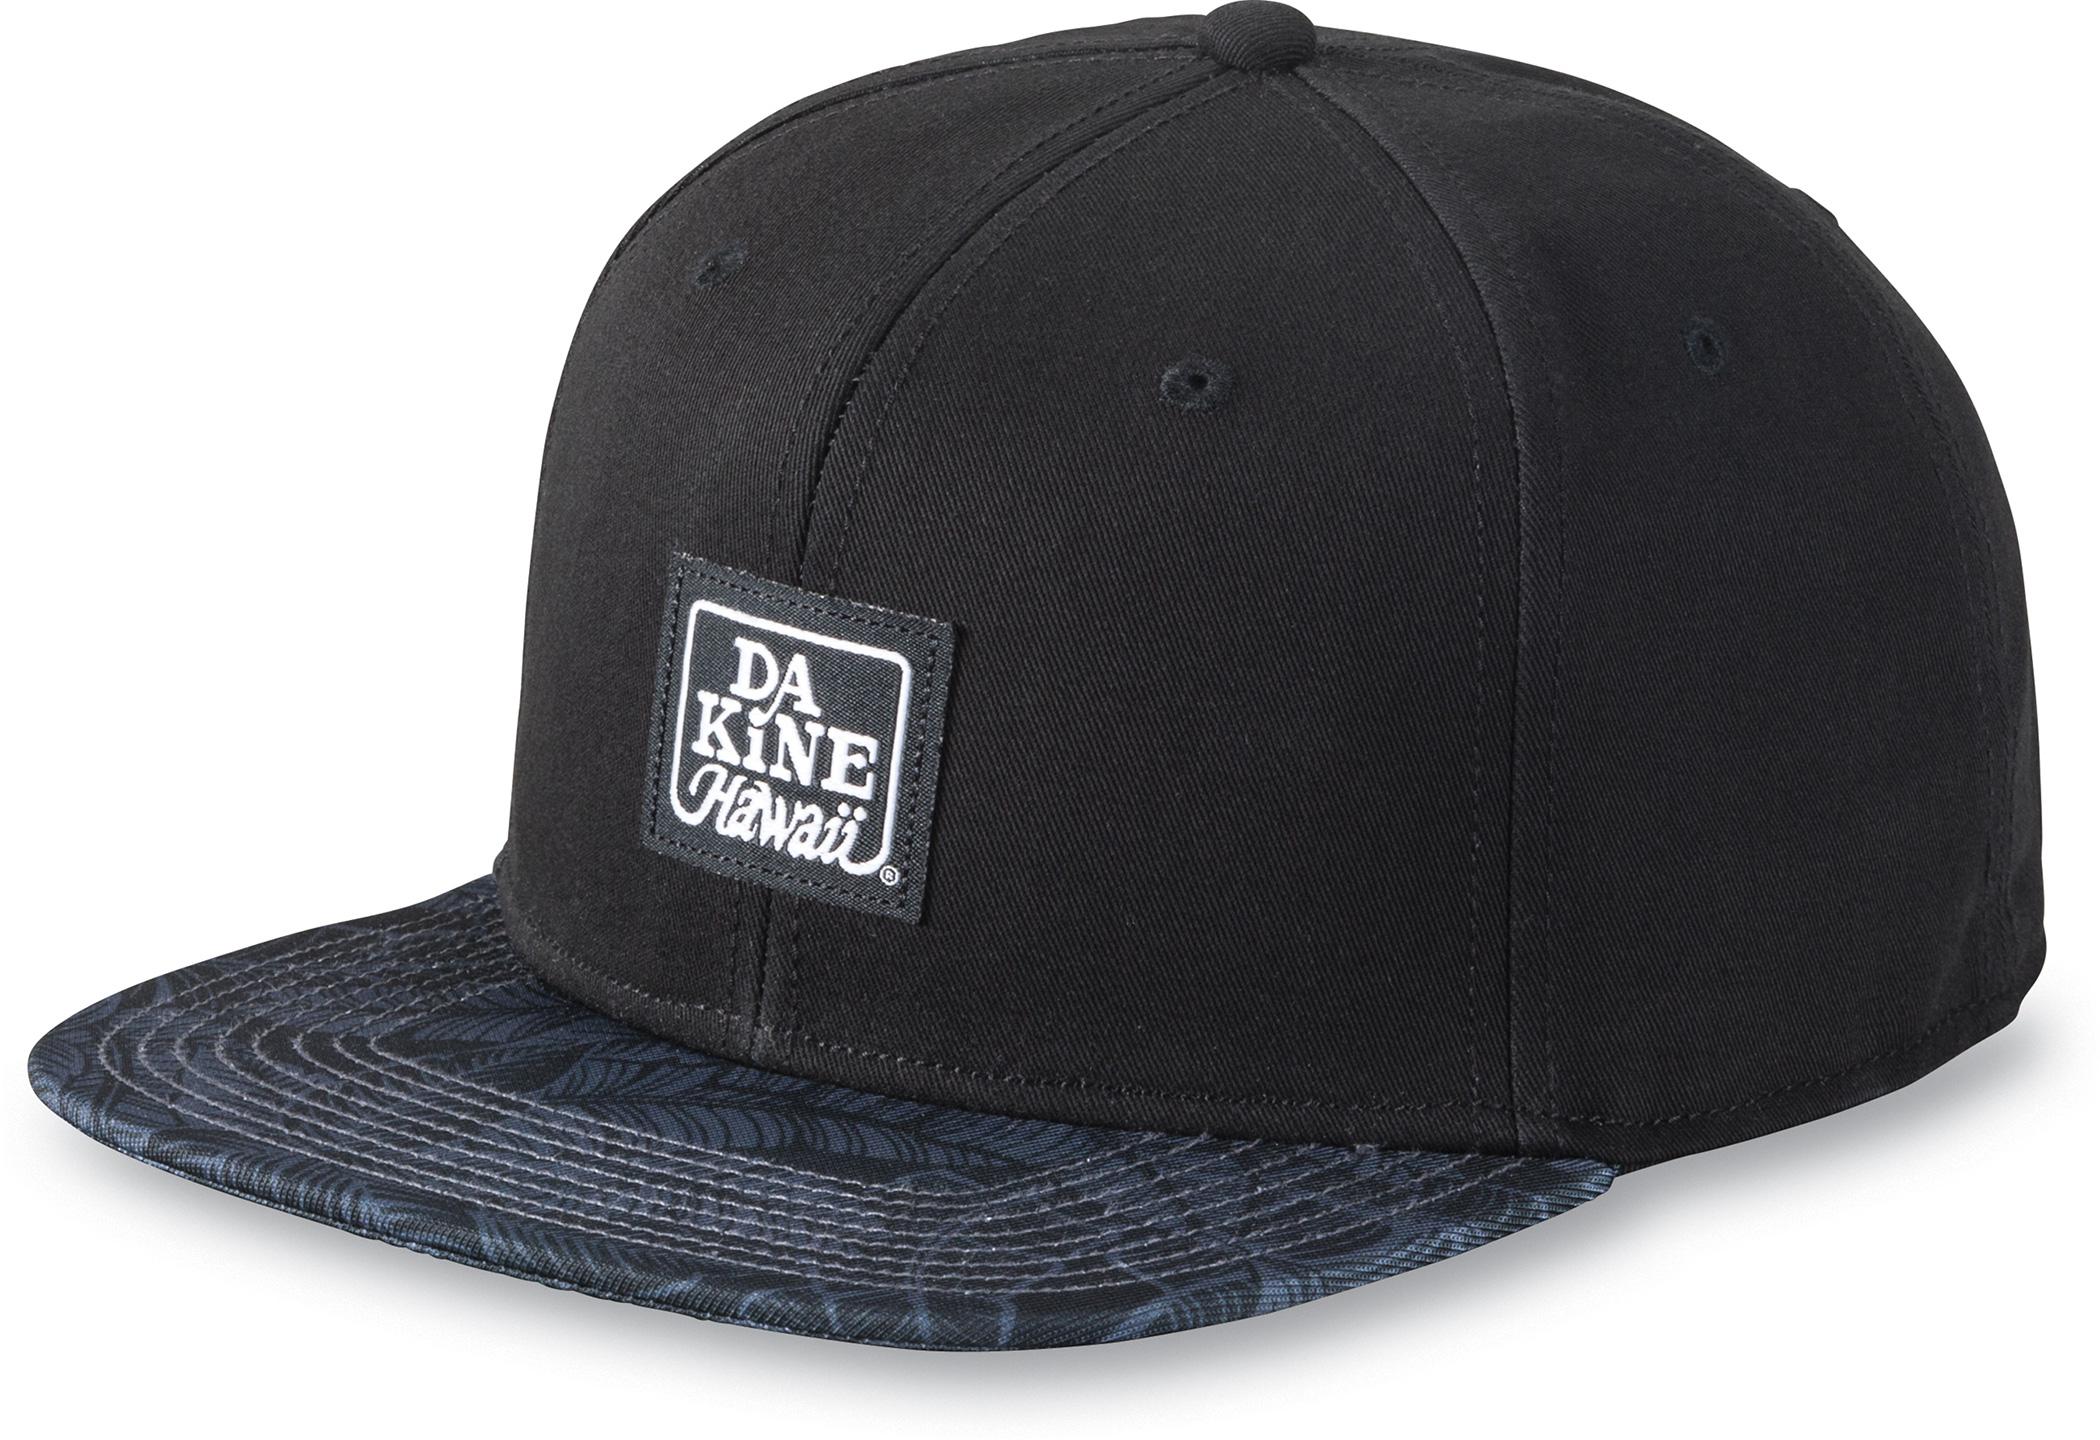 6a41d5085c5f4 /Dakine Mens Ano Hat Black / Stencil Palm     Caps & Hats   The Board  Basement